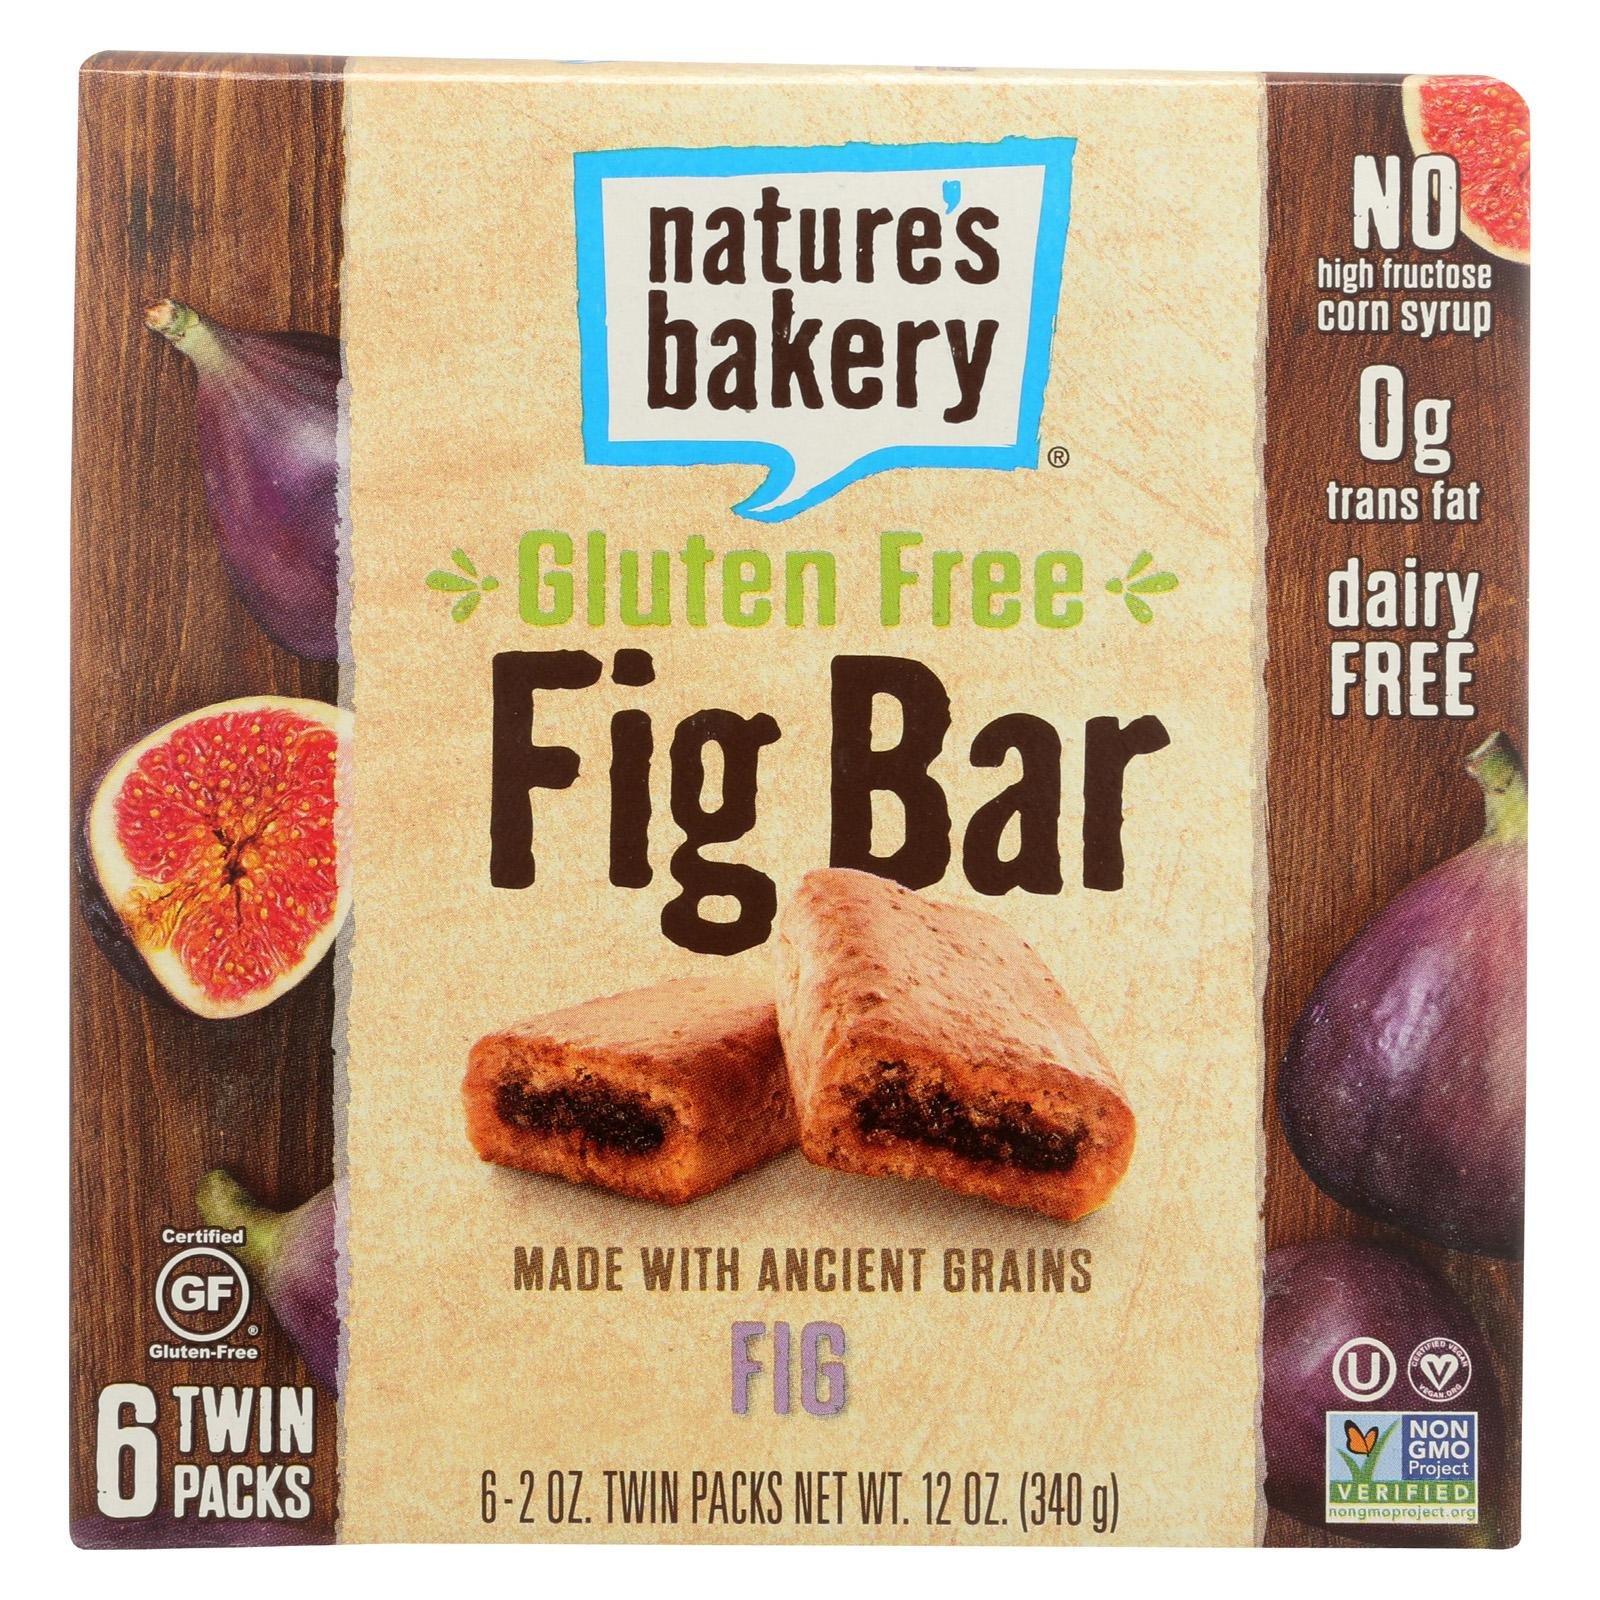 NATURE'S BAKERY, Fig Bar, Original, Gf, Pack of 6, Size 6/2 OZ, (Gluten Free Kosher)